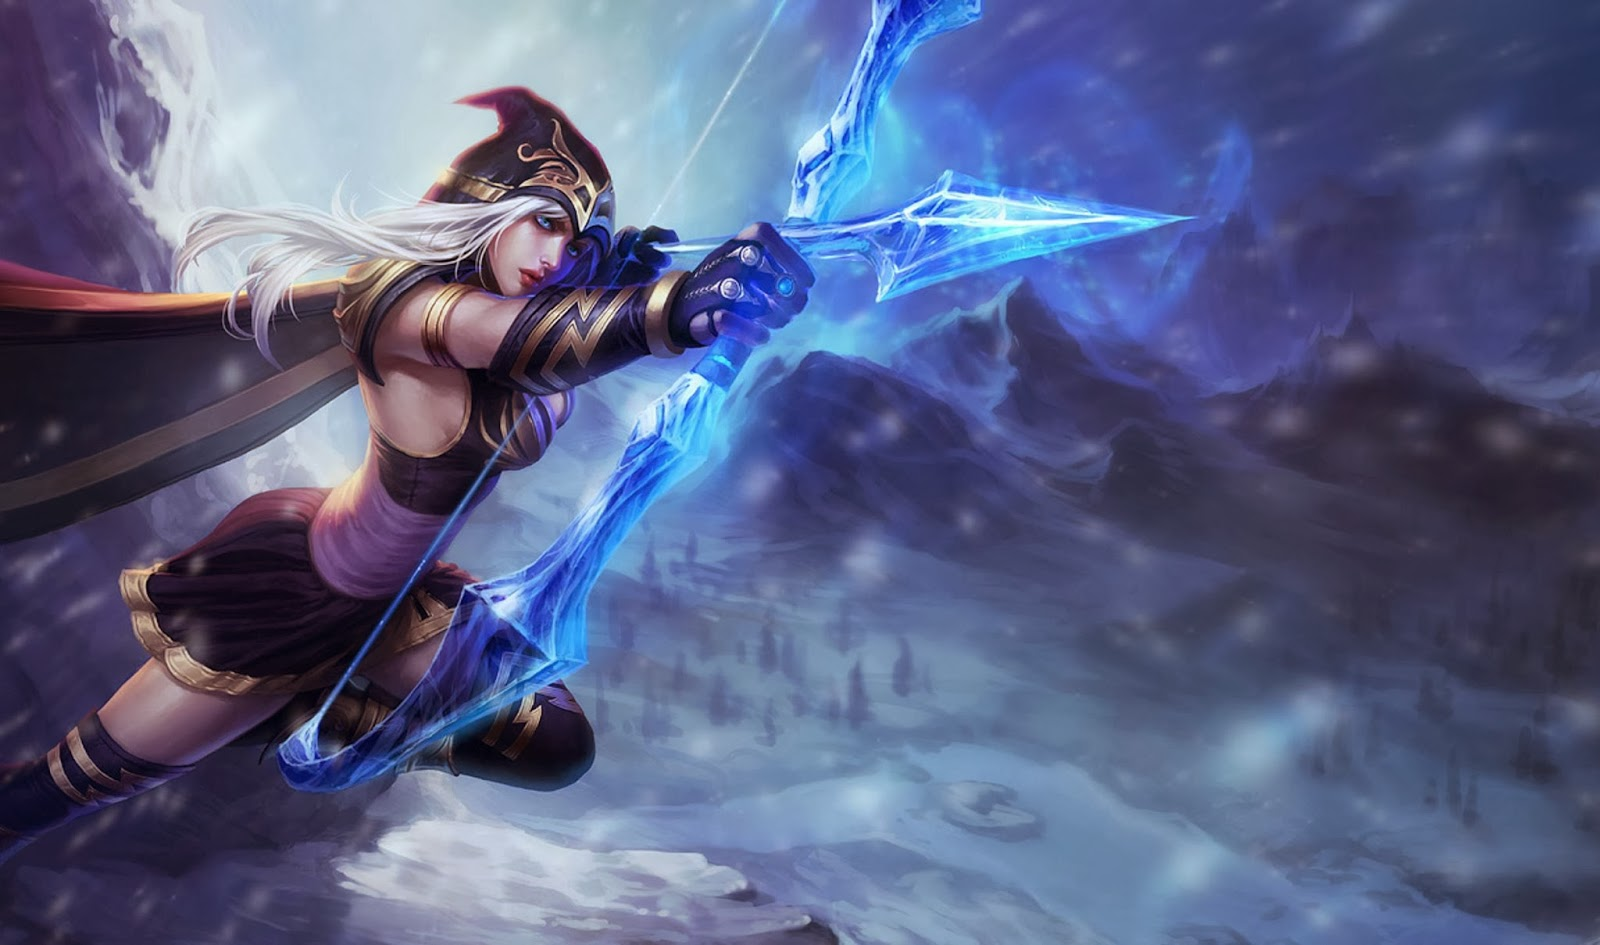 Ashe League of Legends Wallpaper, Ashe Desktop Wallpaper